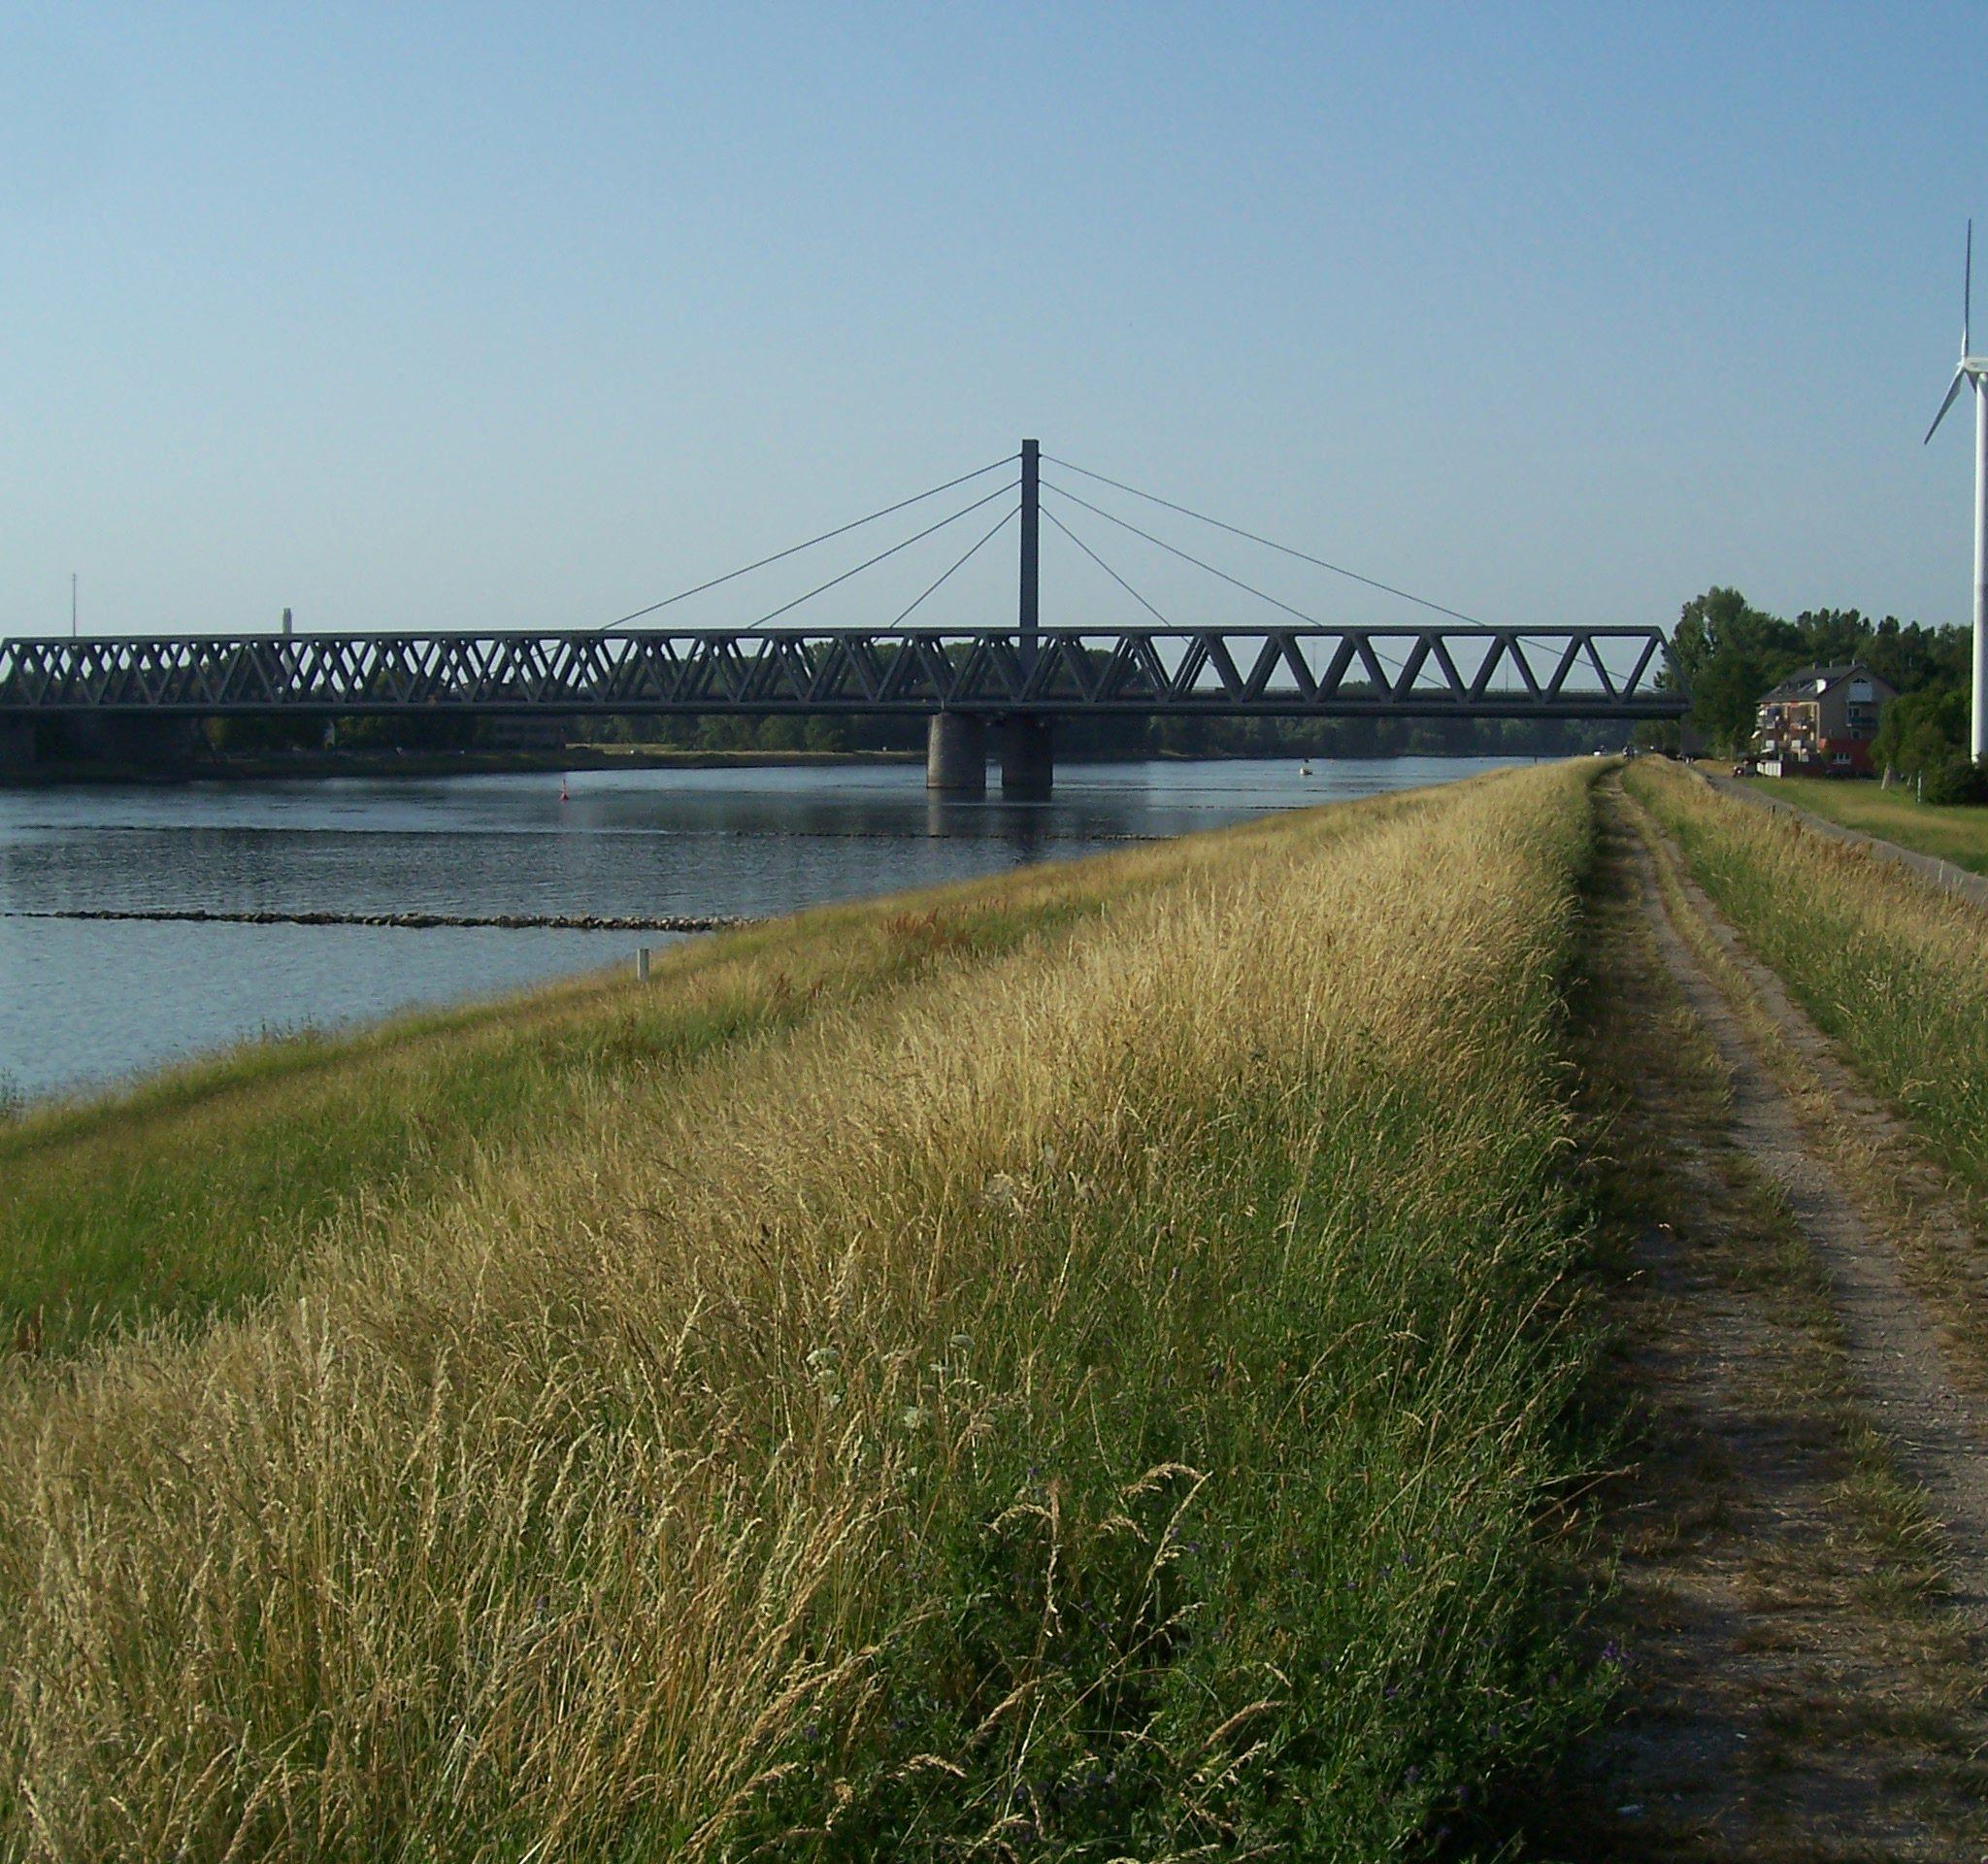 Ter illustratie. De Rijn bij de Eisenbahnbrücke in de buurt van Karlsruhe. (Foto Wikimedia/Andreas Keller)